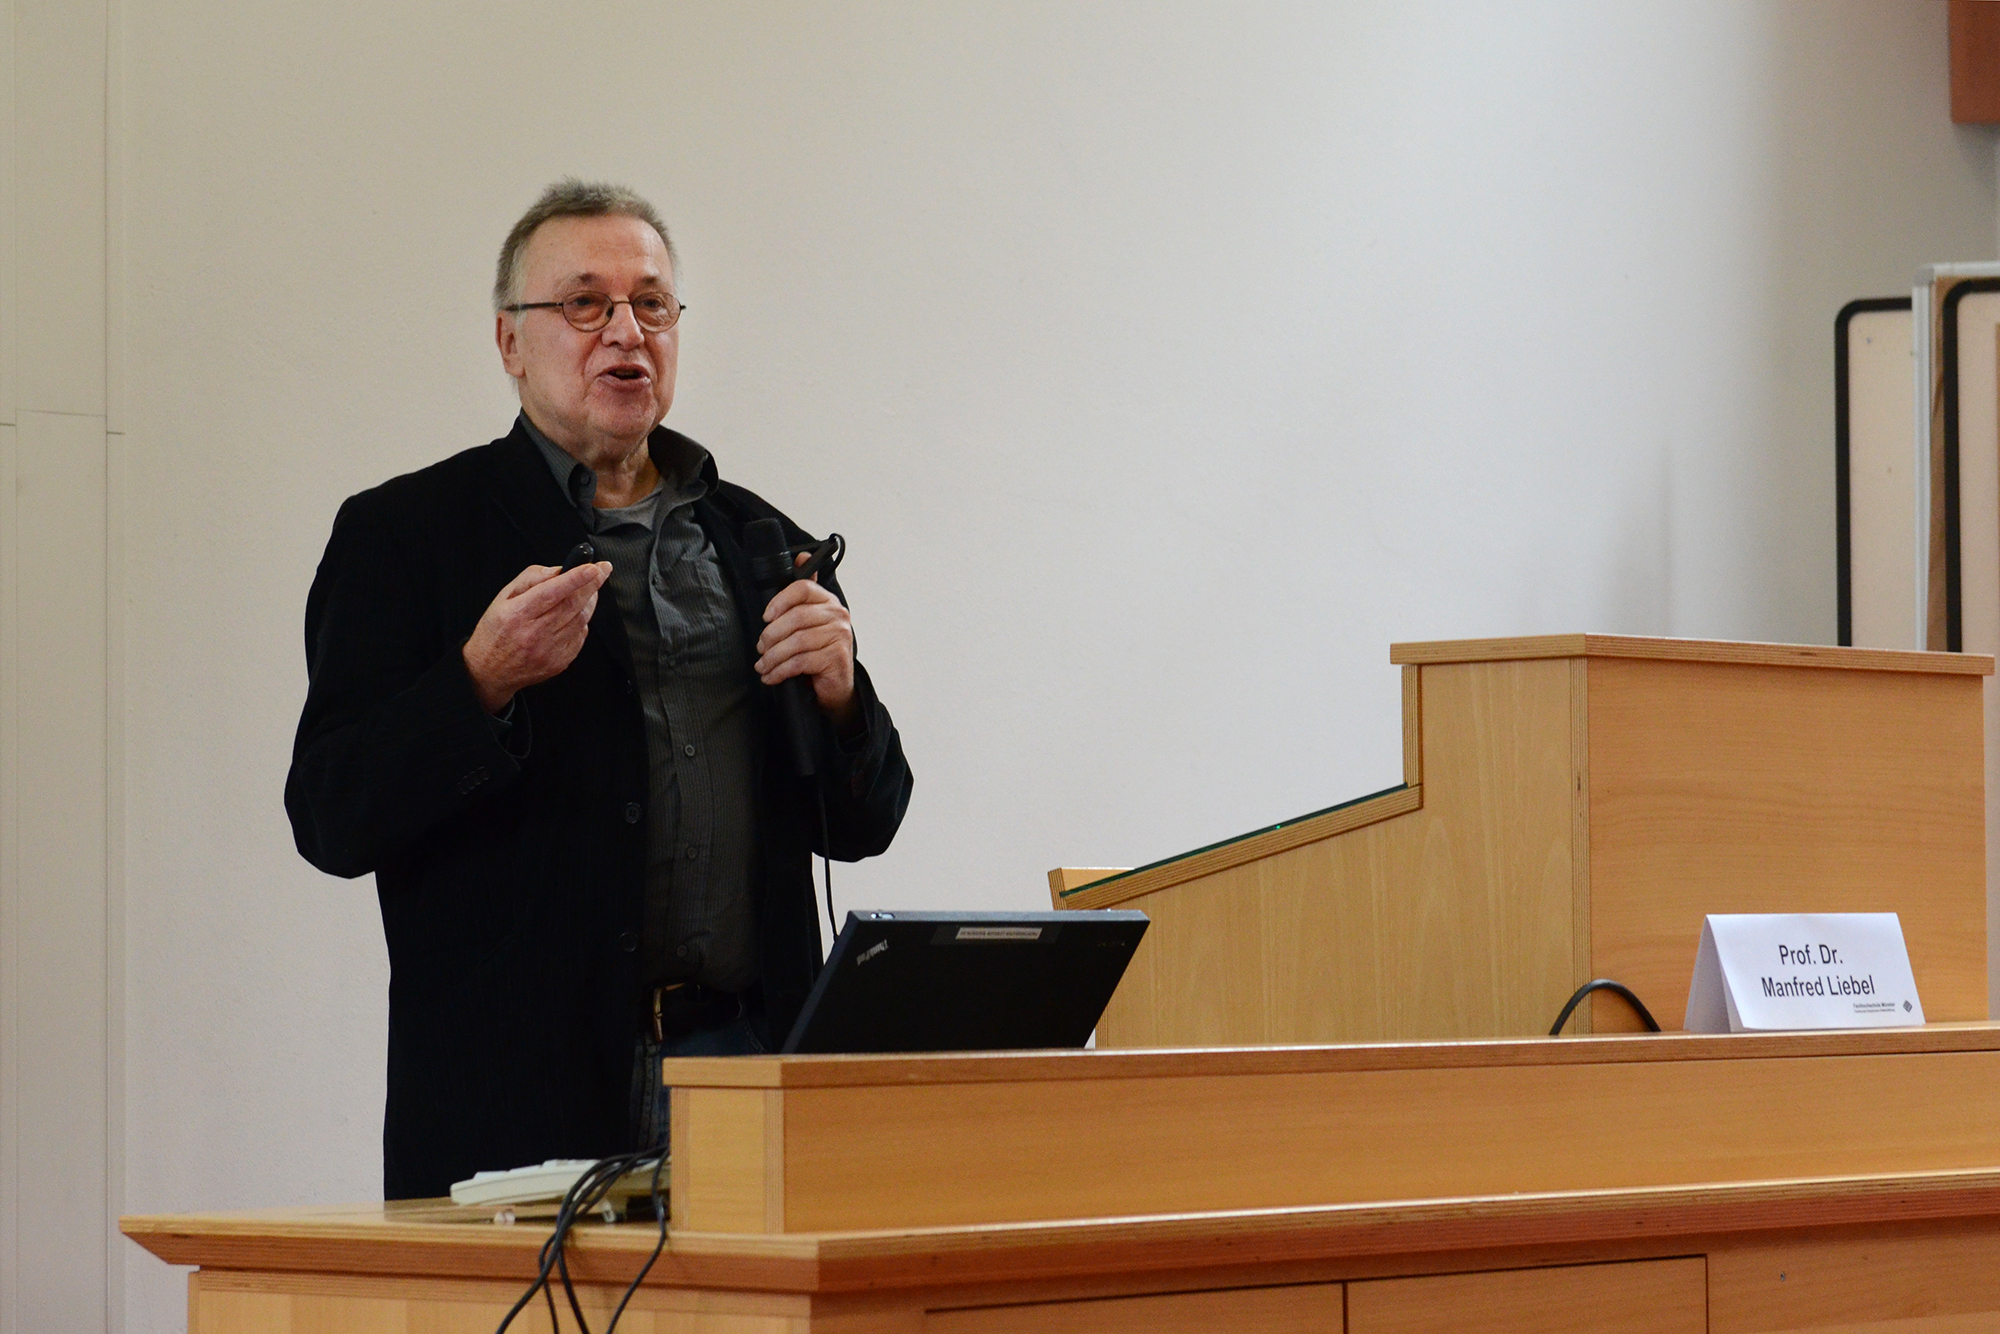 Prof. Dr. Manfred Liebel